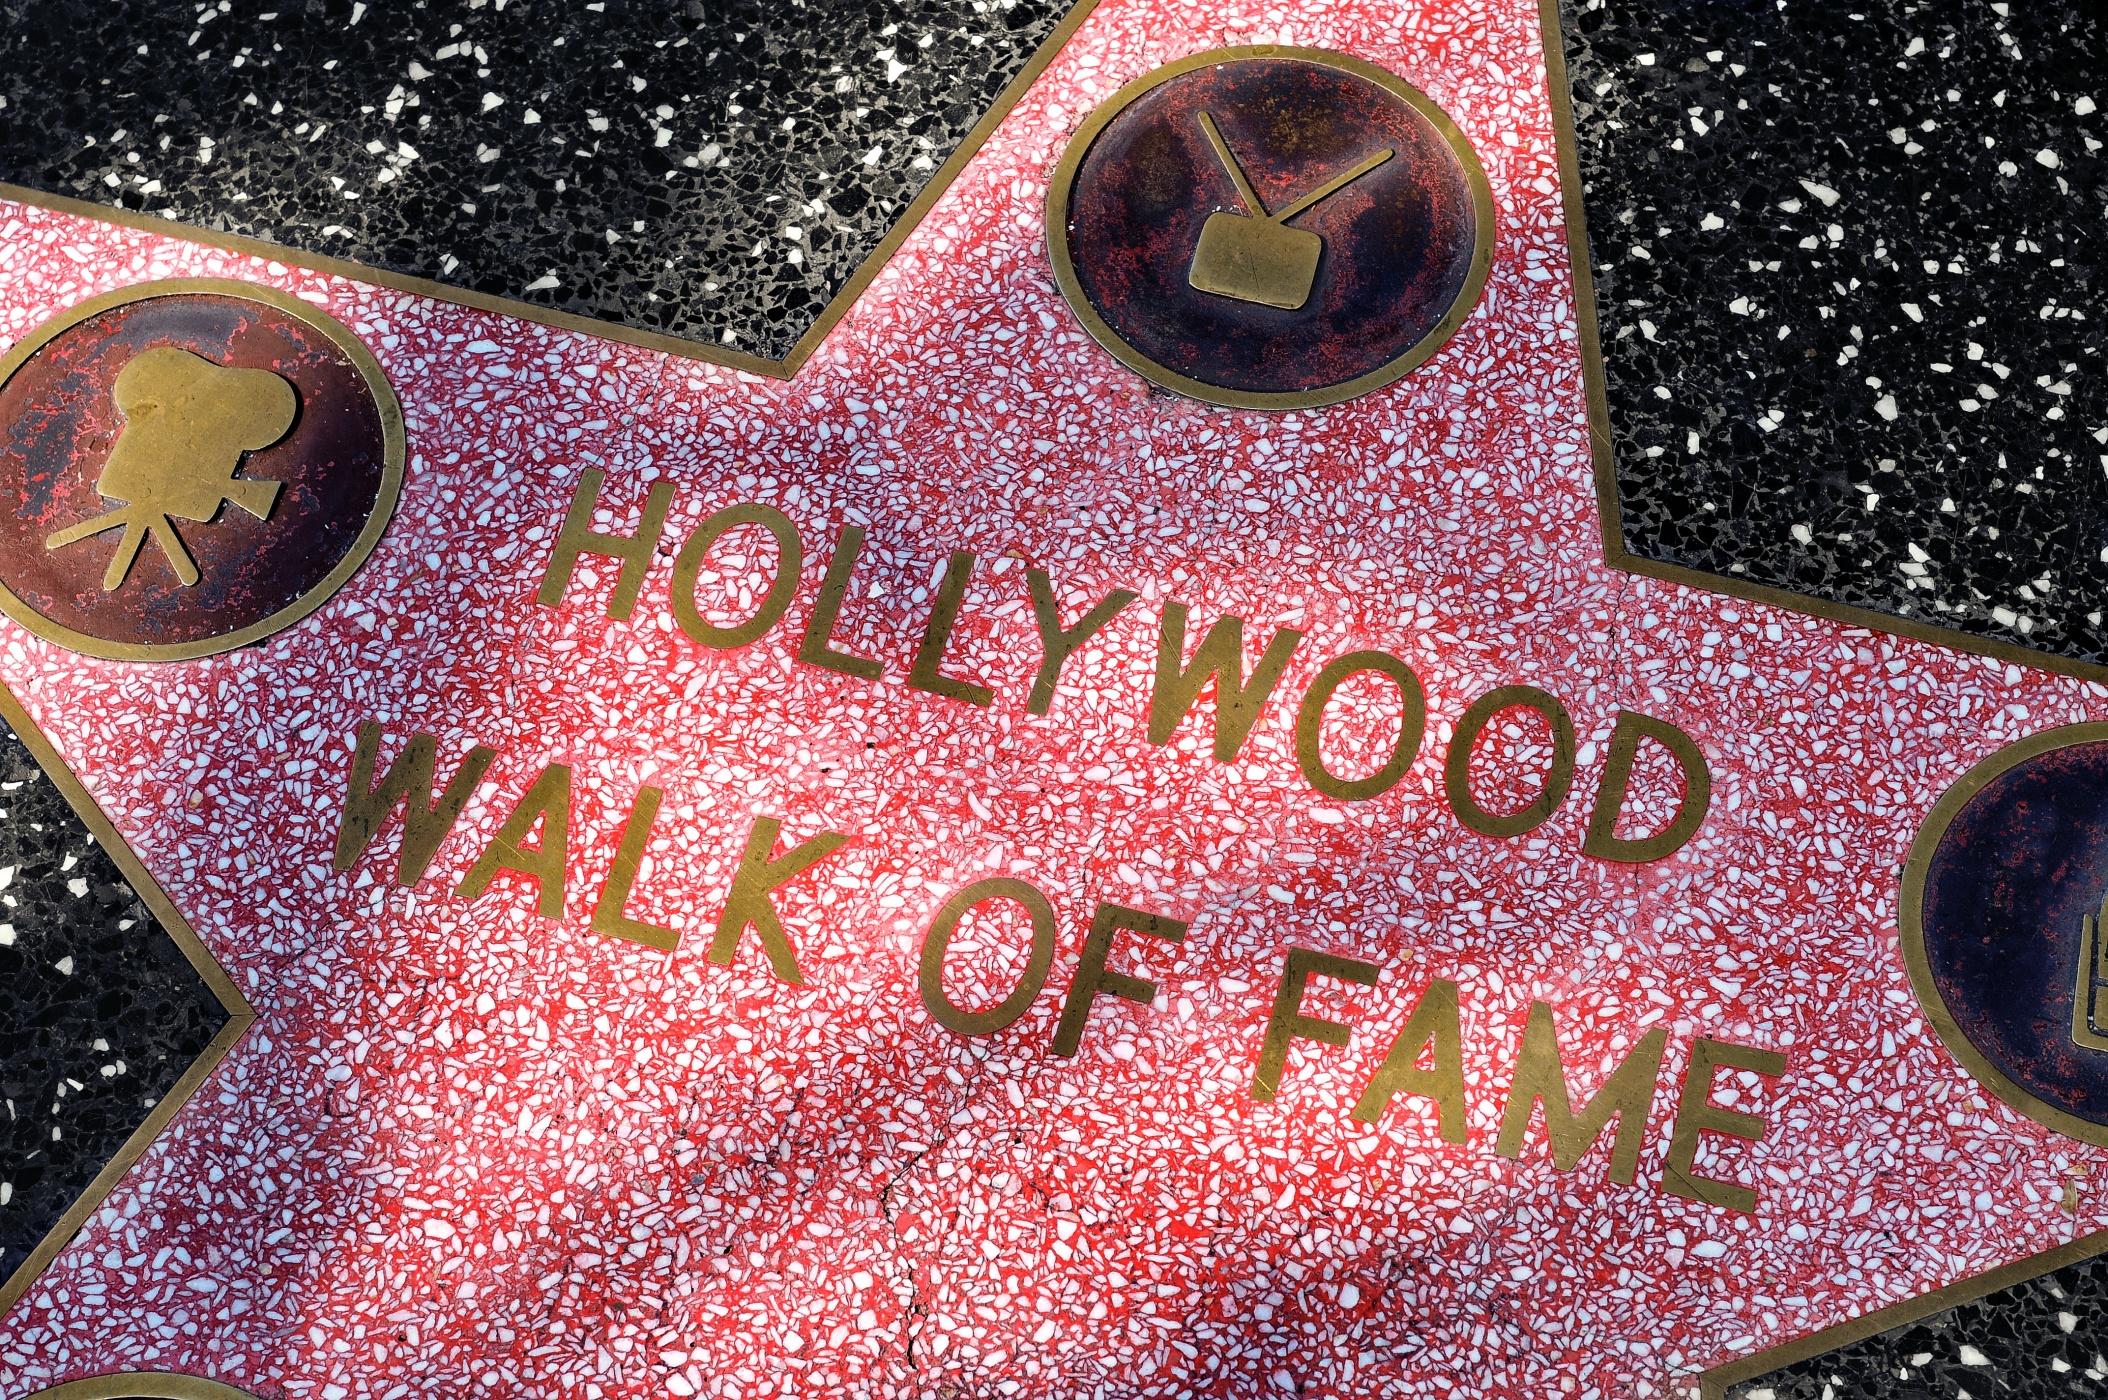 Картинки по запросу аллея звезд голливуд